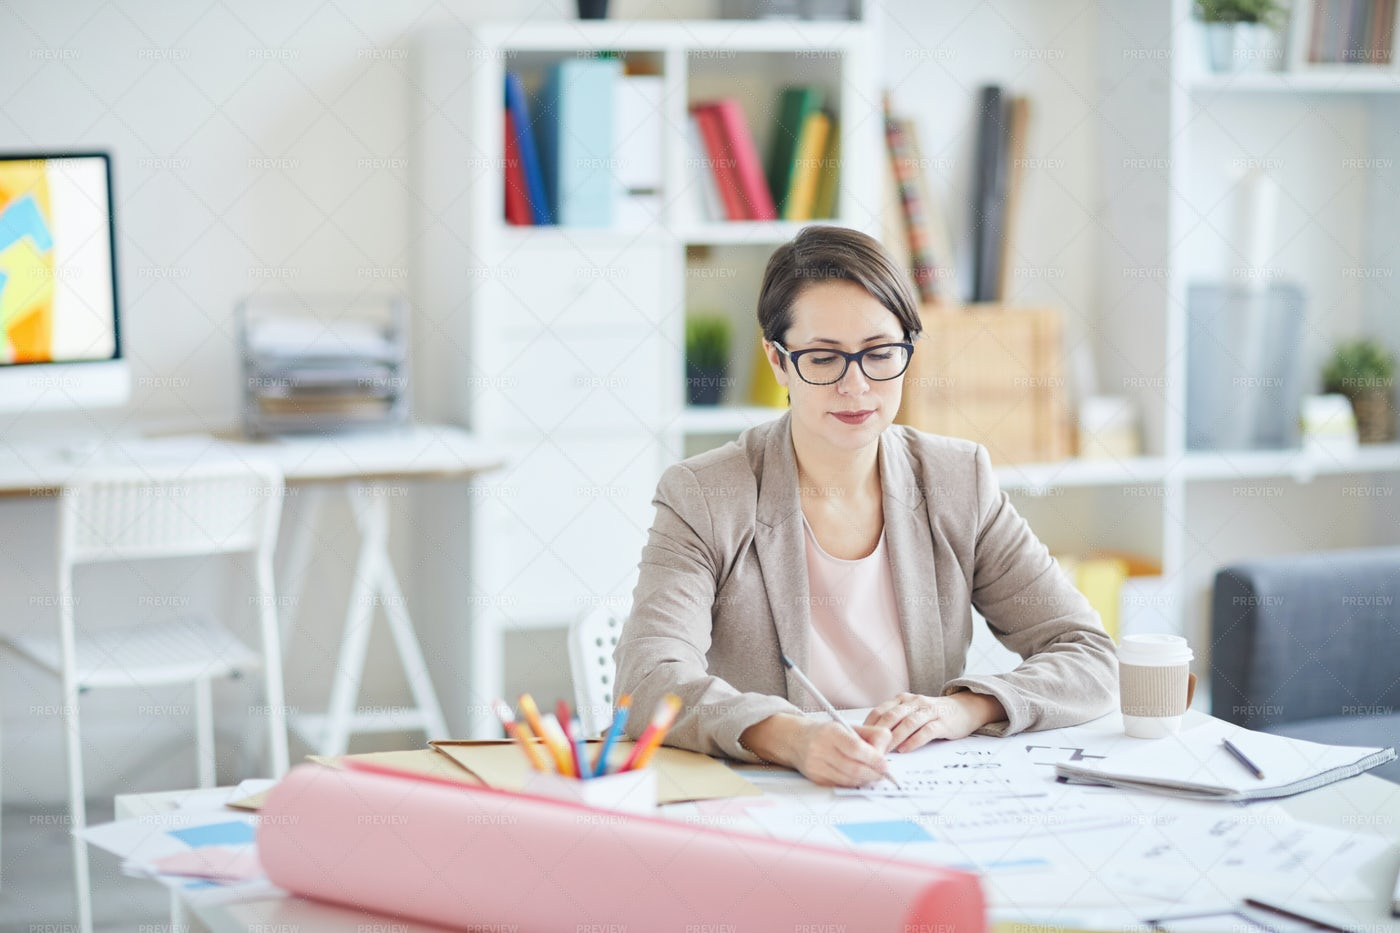 Woman Creating Designs: Stock Photos